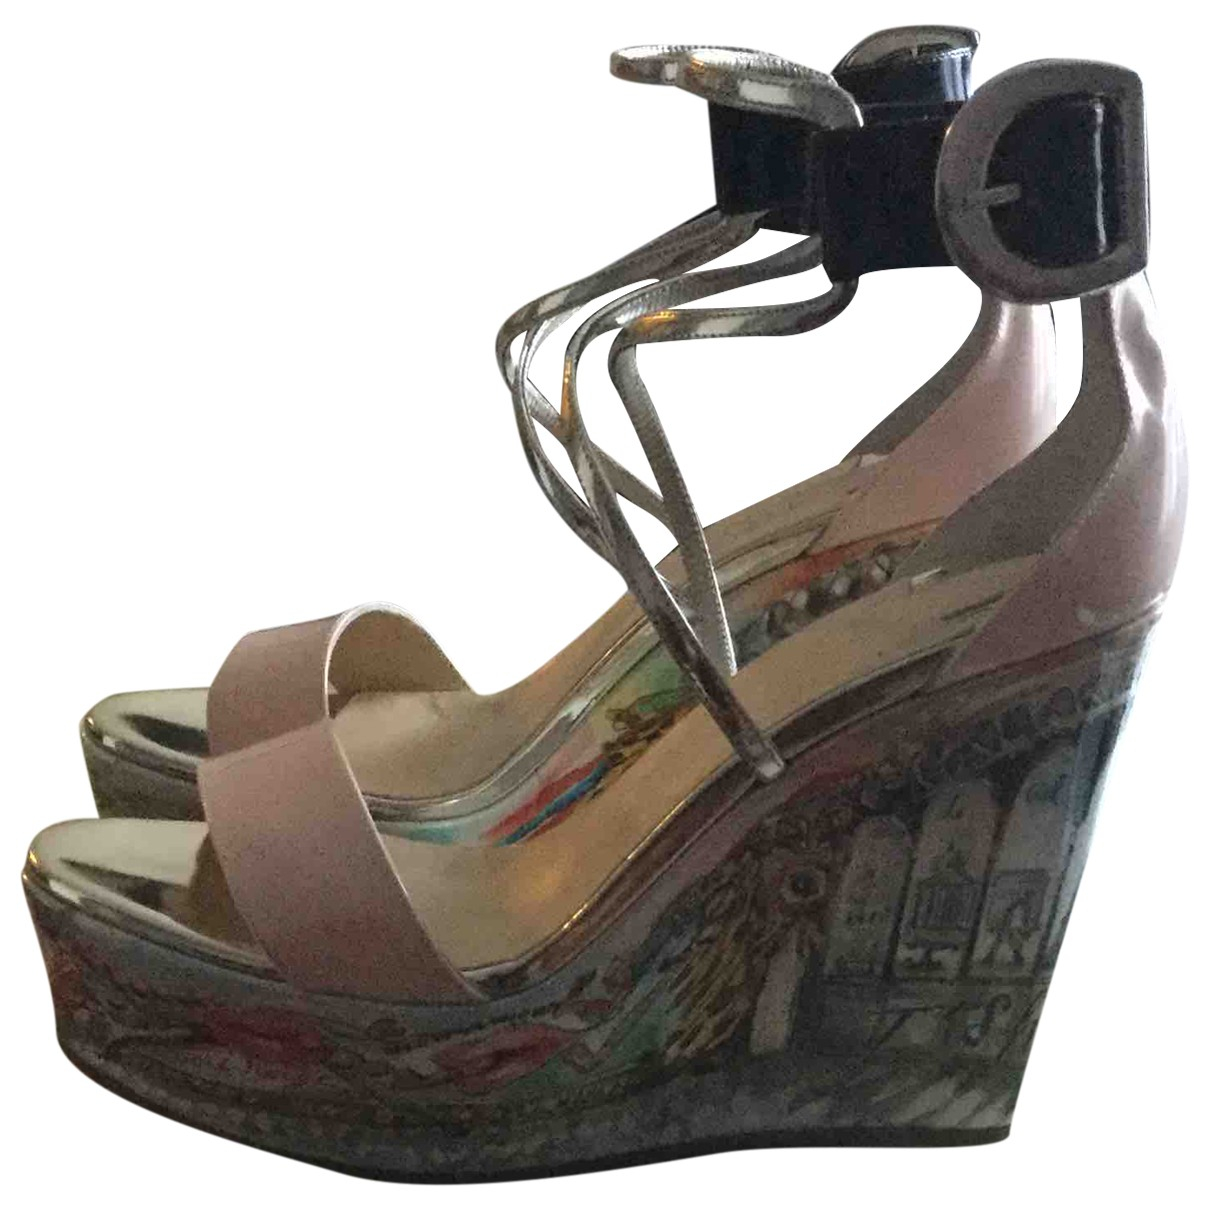 Christian Louboutin N Metallic Patent leather Sandals for Women 39 EU